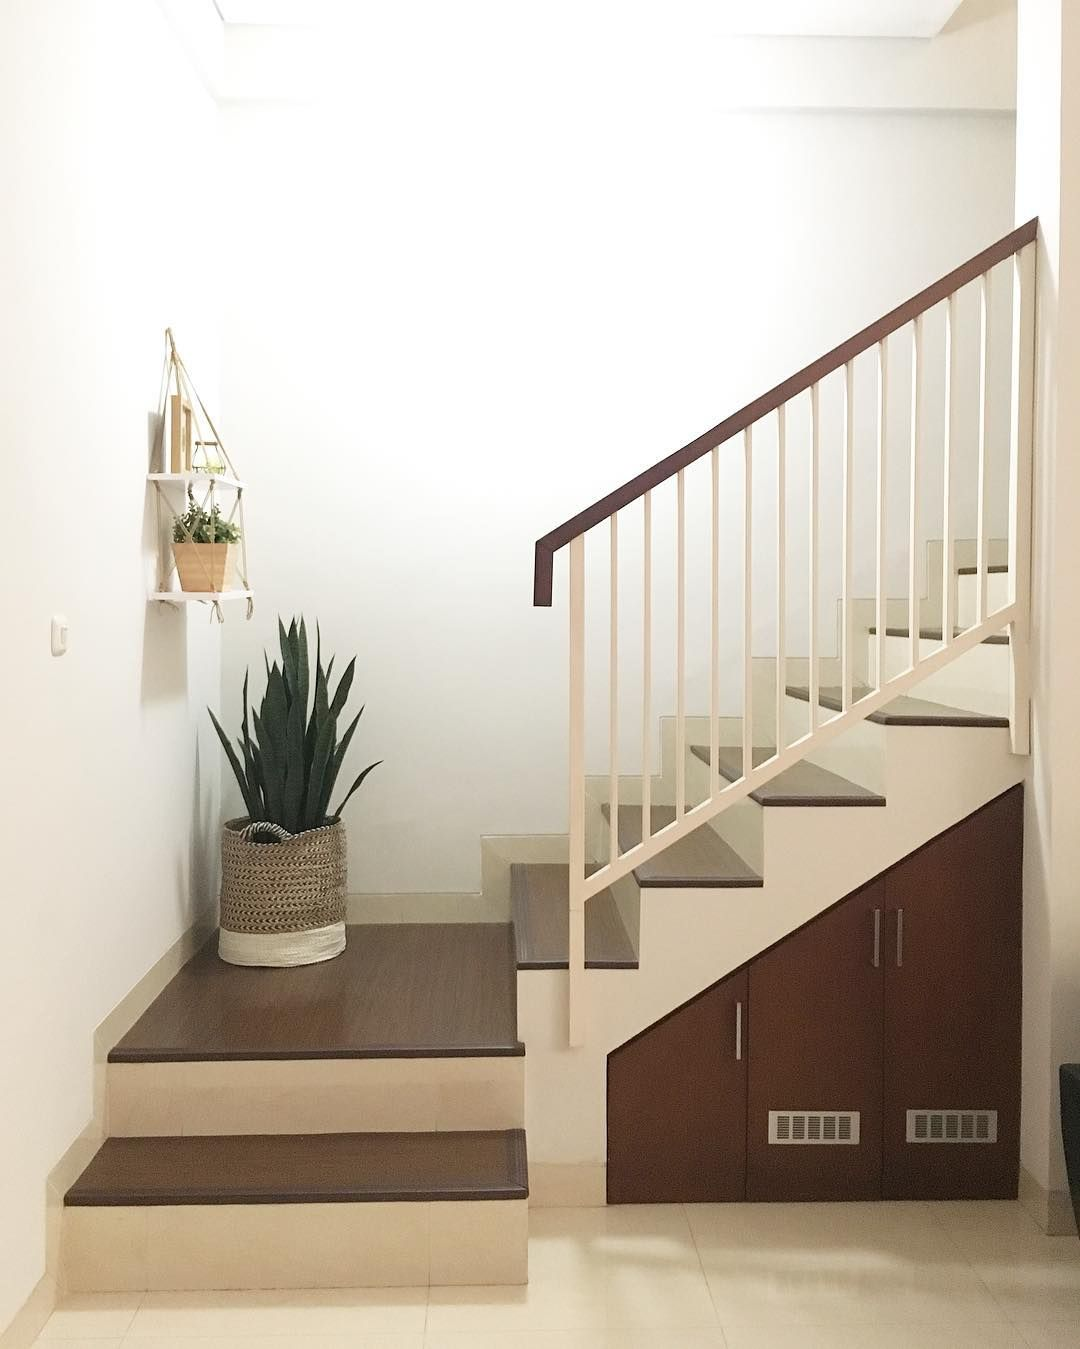 Tangga Rumah Sederhana : tangga, rumah, sederhana, Tangga, Rumah, Minimalis, Desain, Tangga,, Minimalis,, Modern